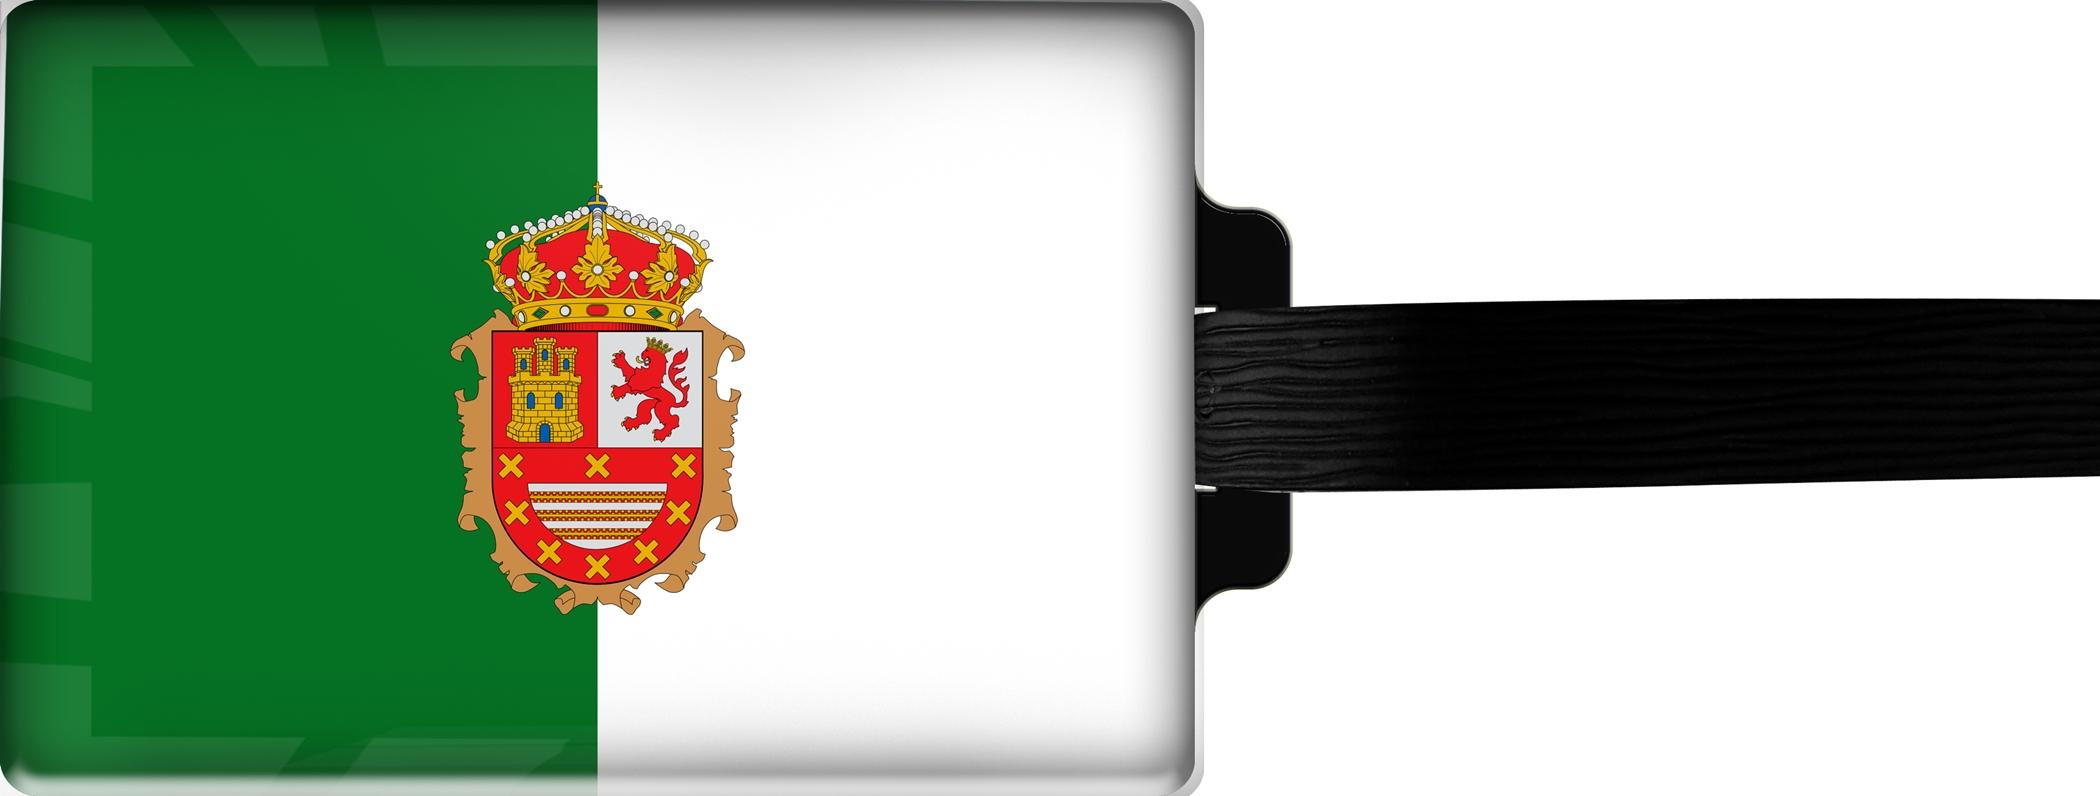 Hochwertiger Gepäckanhänger aus Acrylglas | FLAGGE FUERTEVENTURA | metALUm #00092